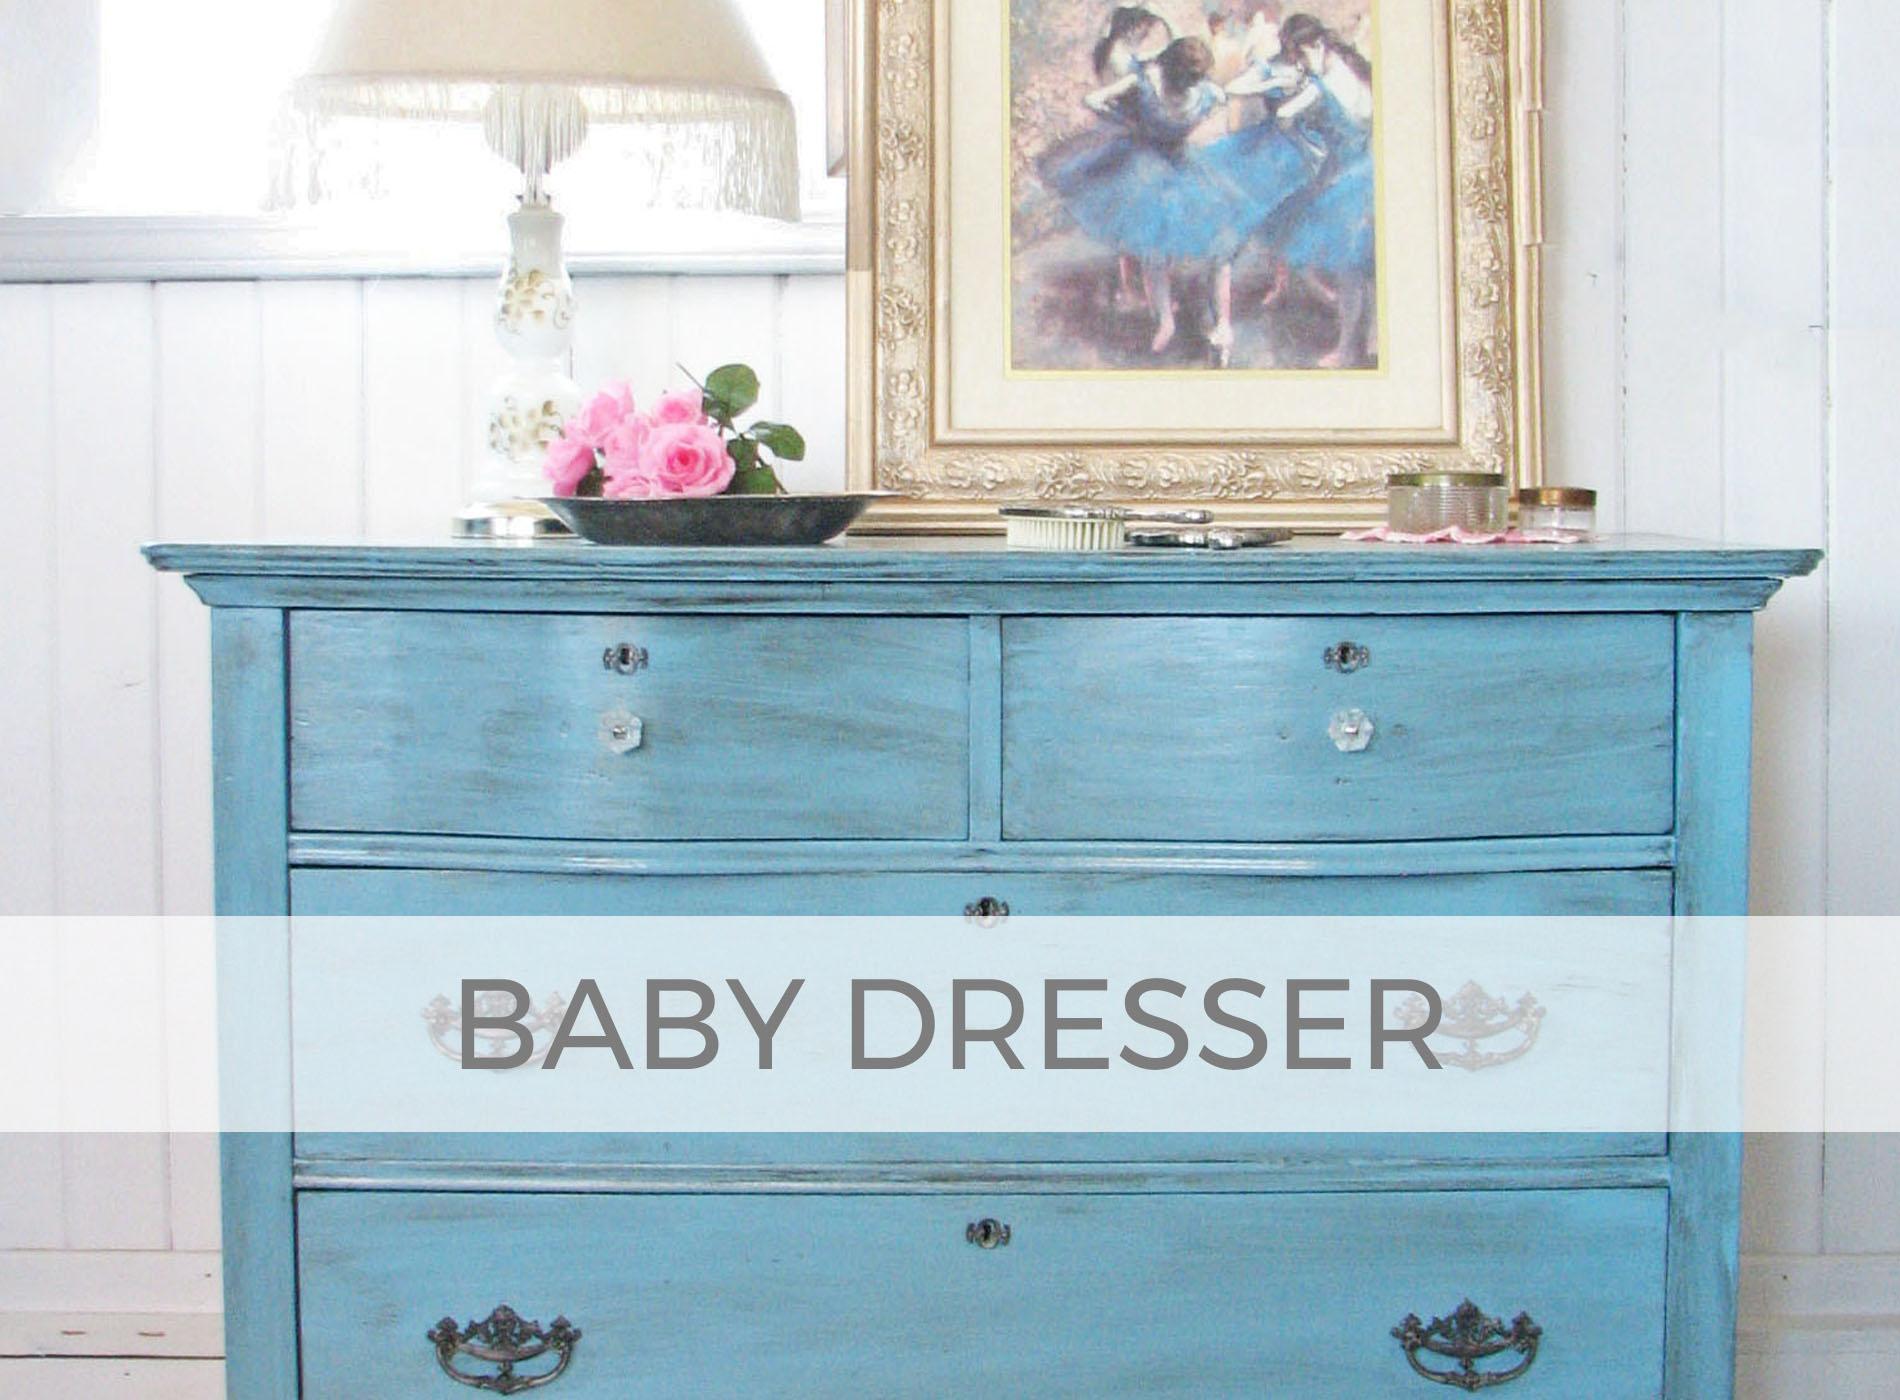 Antique Dresser made new for Baby by Larissa of Prodigal Pieces | prodigalpieces.com